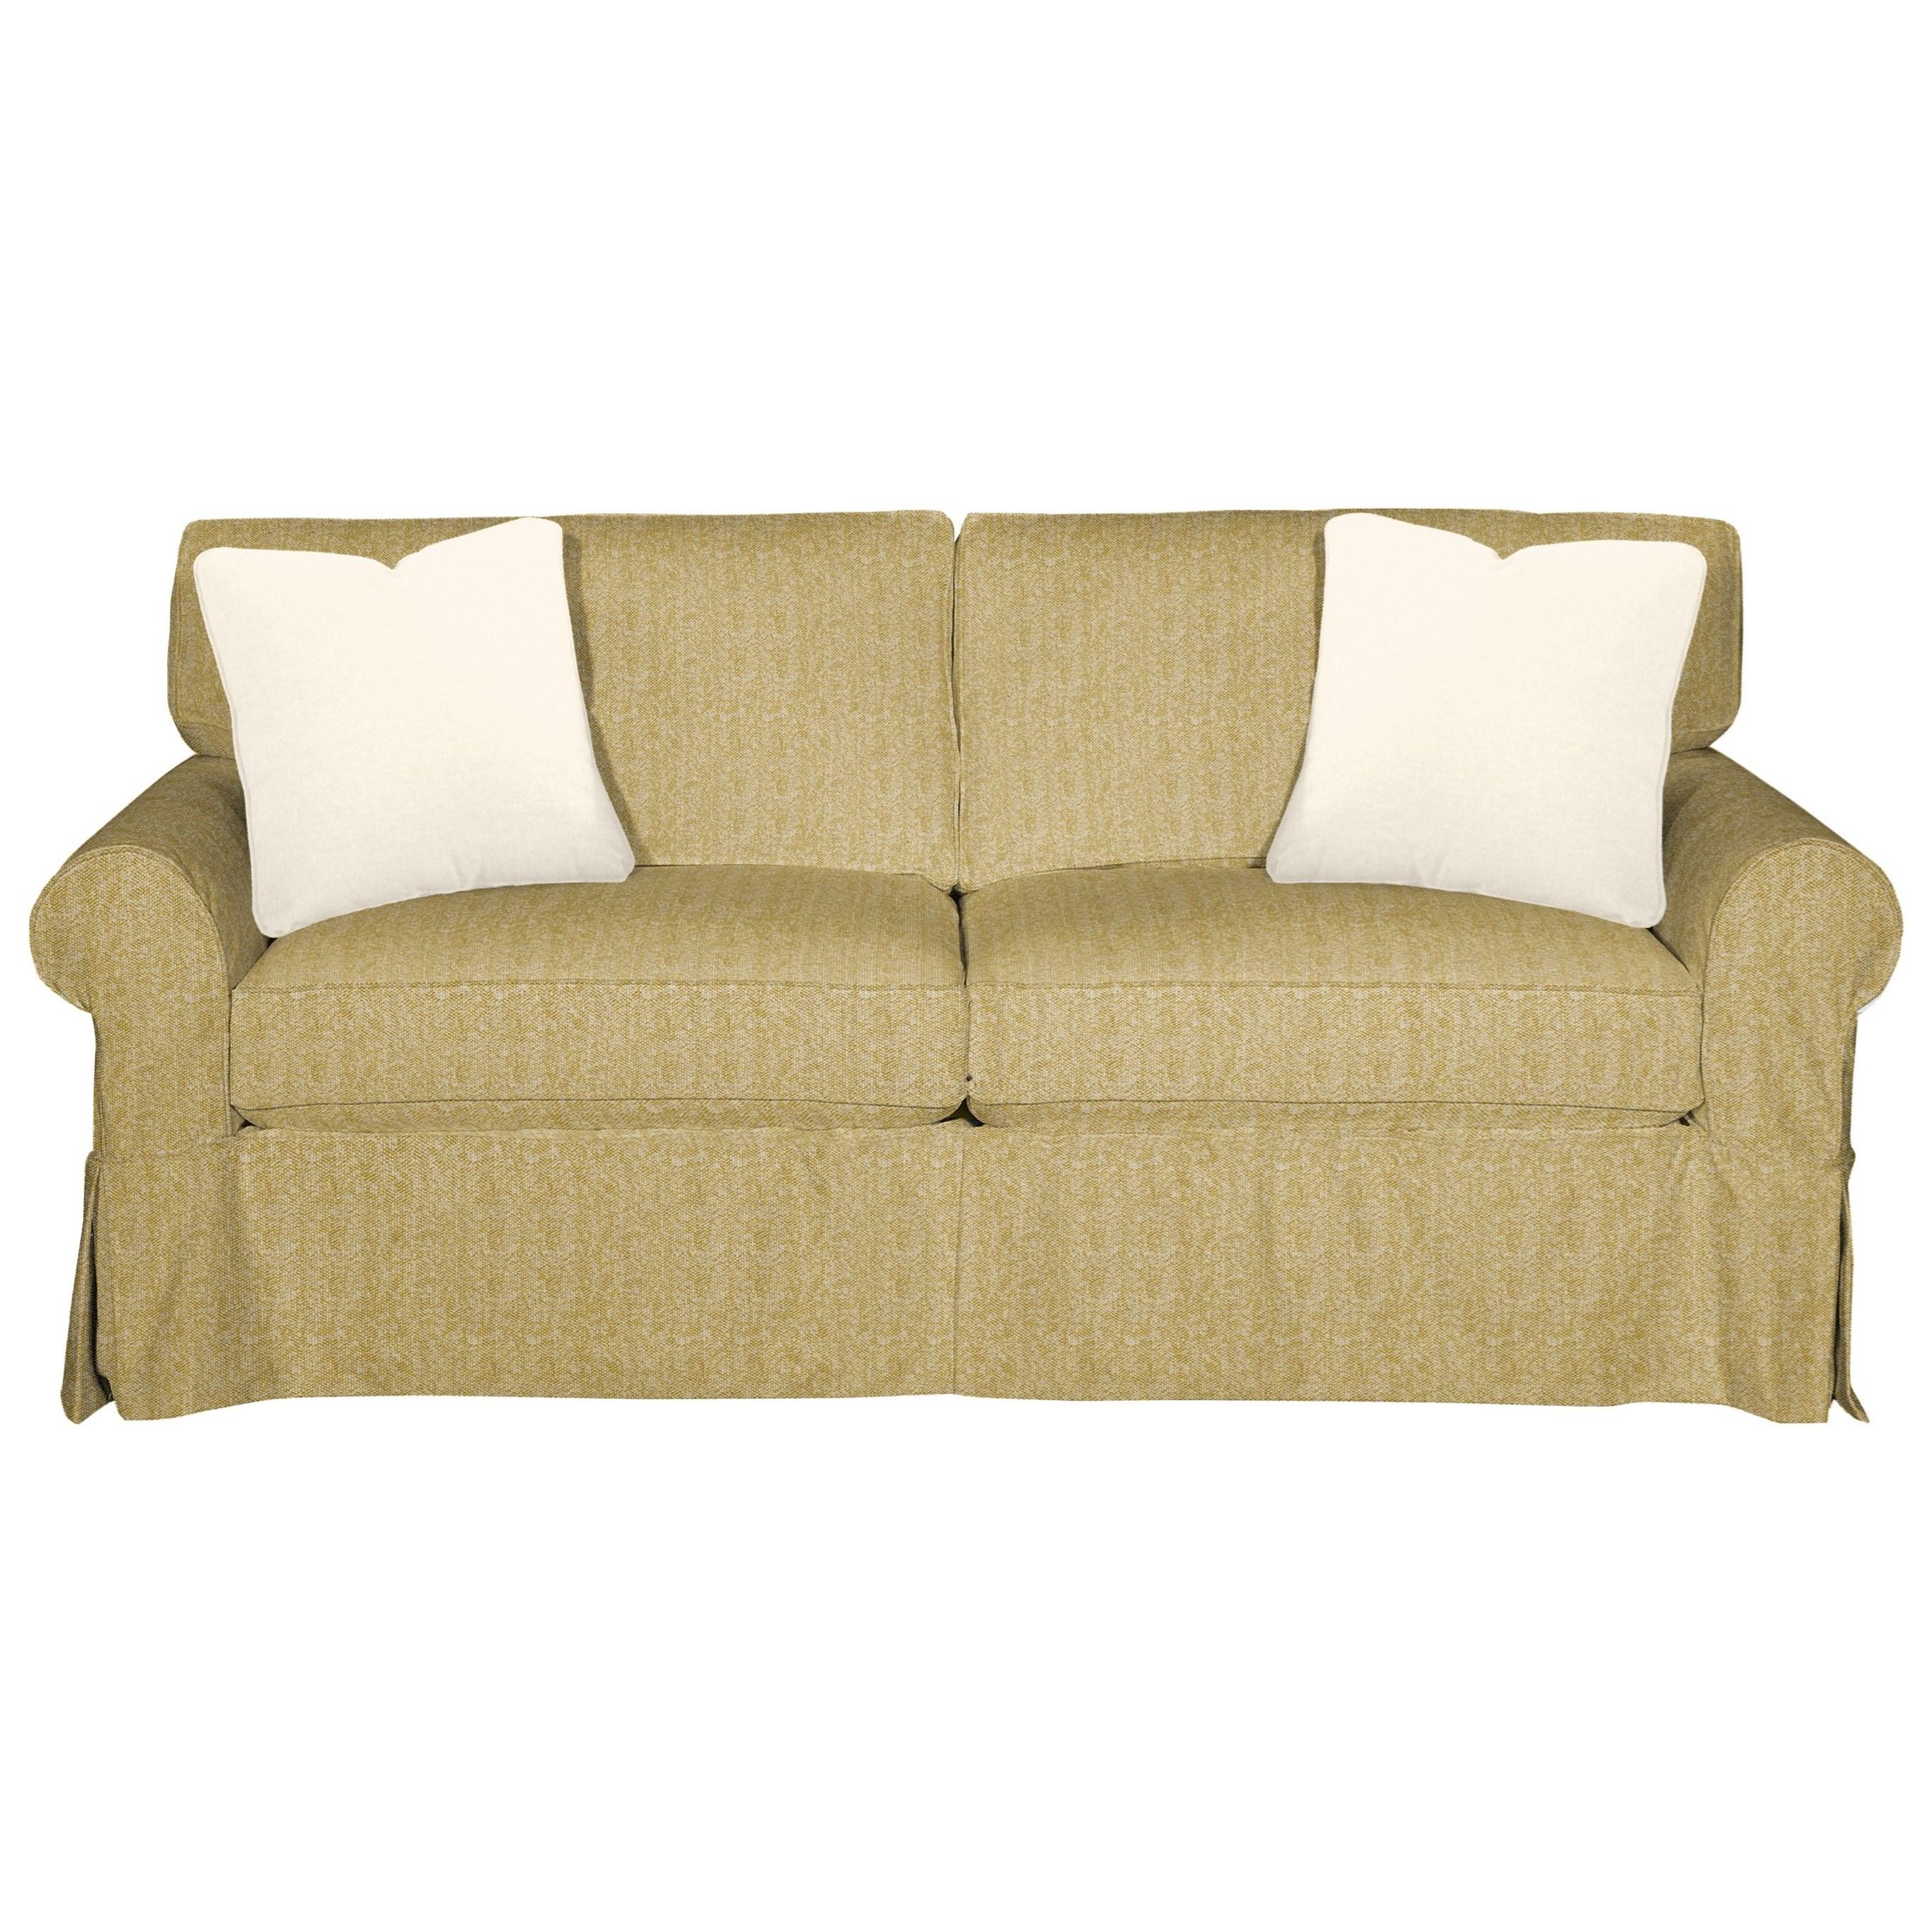 9228 Sleeper Sofa w/ Innerspring Mattress by Craftmaster at Turk Furniture